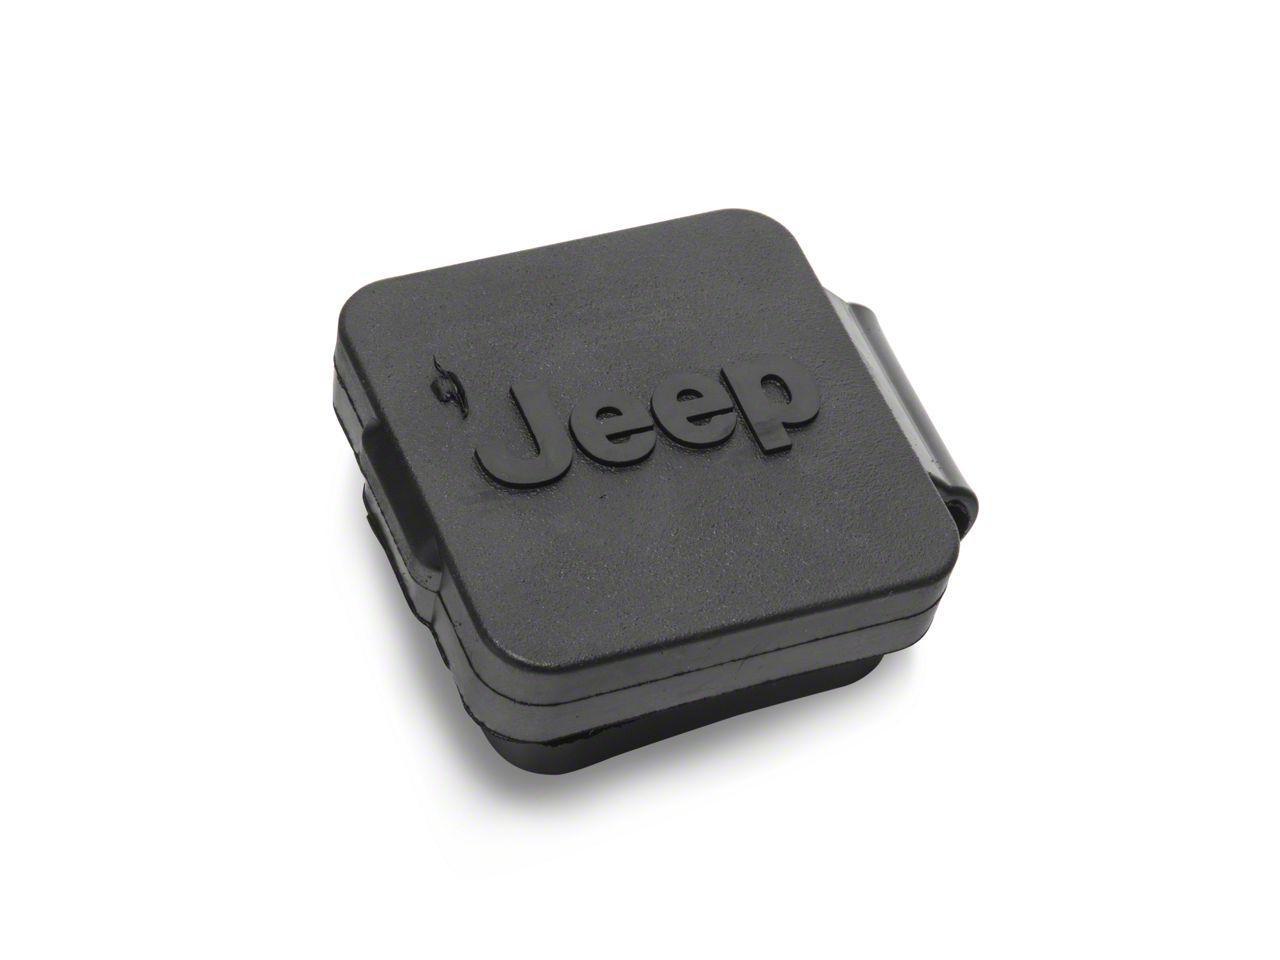 Mopar 2 in. Receiver Hitch Plug (87-18 Jeep Wrangler YJ, TJ, JK & JL)